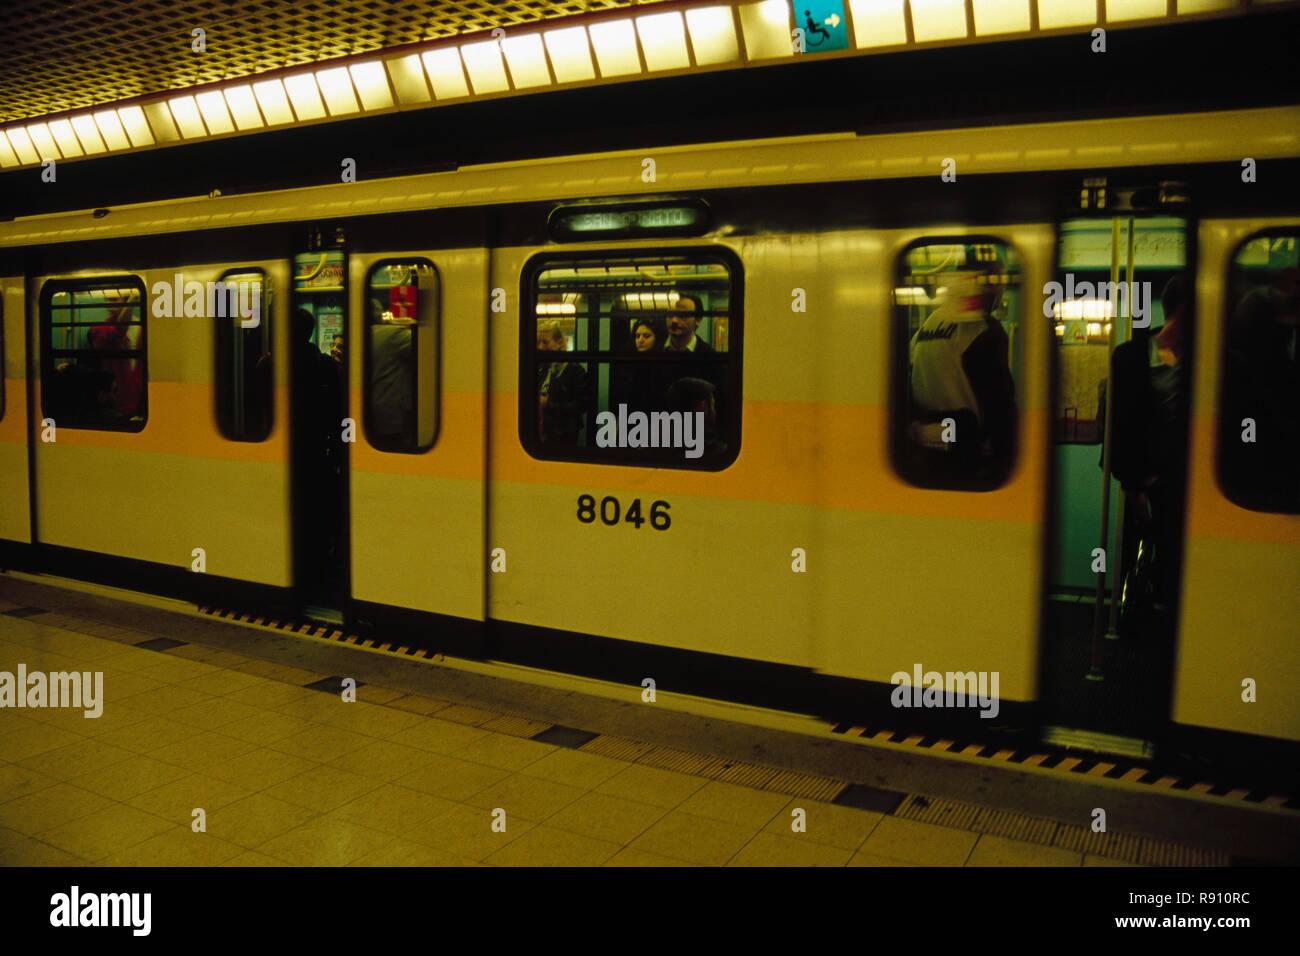 underground metro railway station platform, yellow line, milan, italy - Stock Image